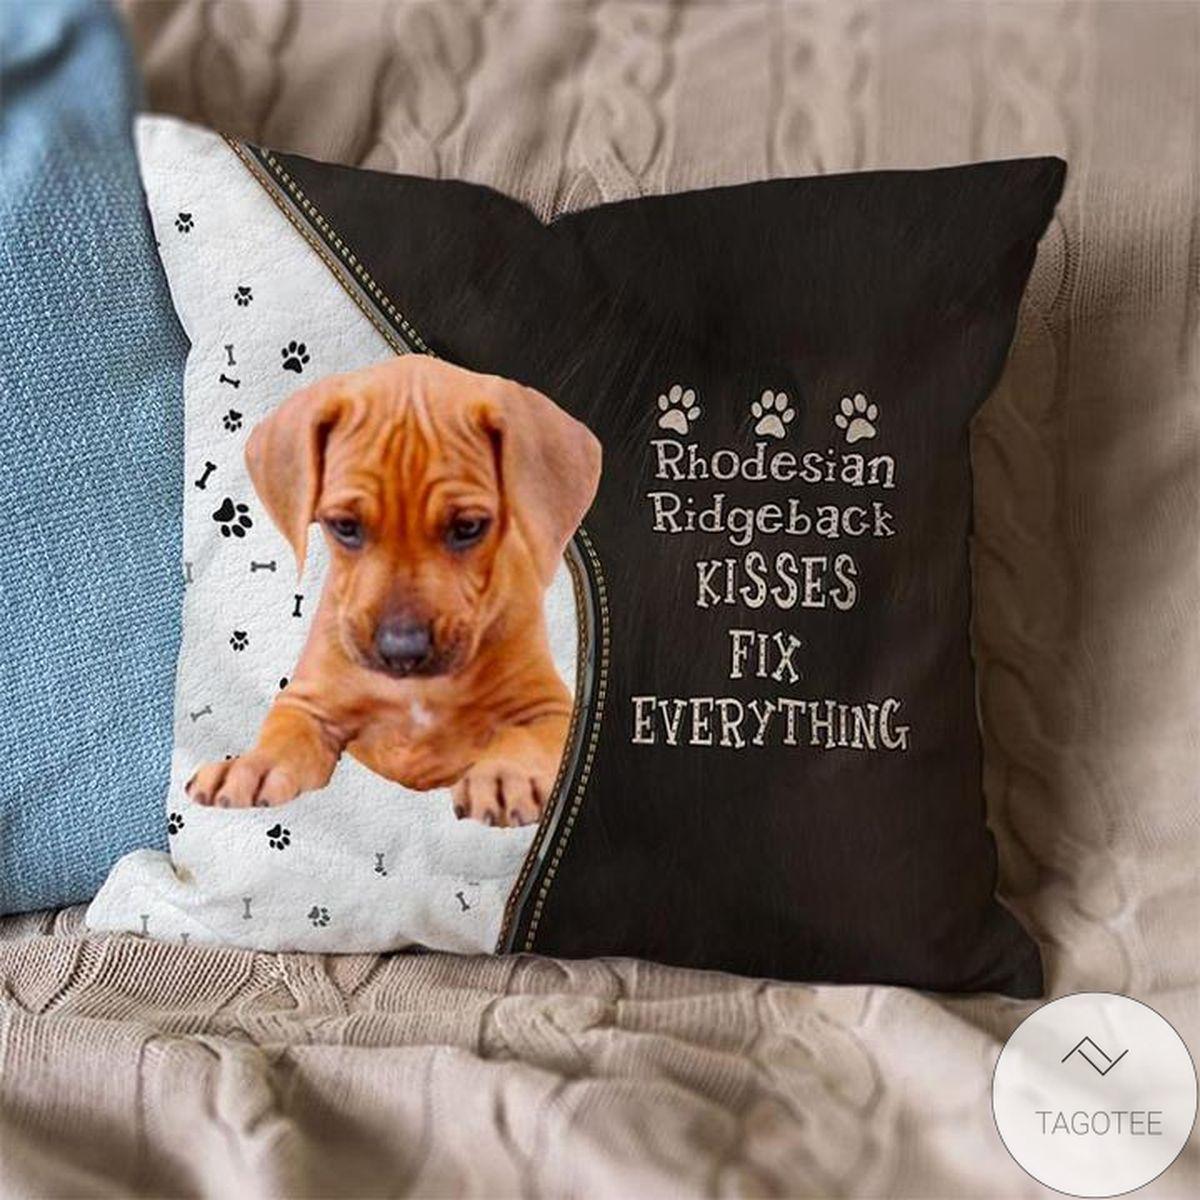 Us Store Rhodesian-Ridgeback Kisses Fix Everything Pillowcase